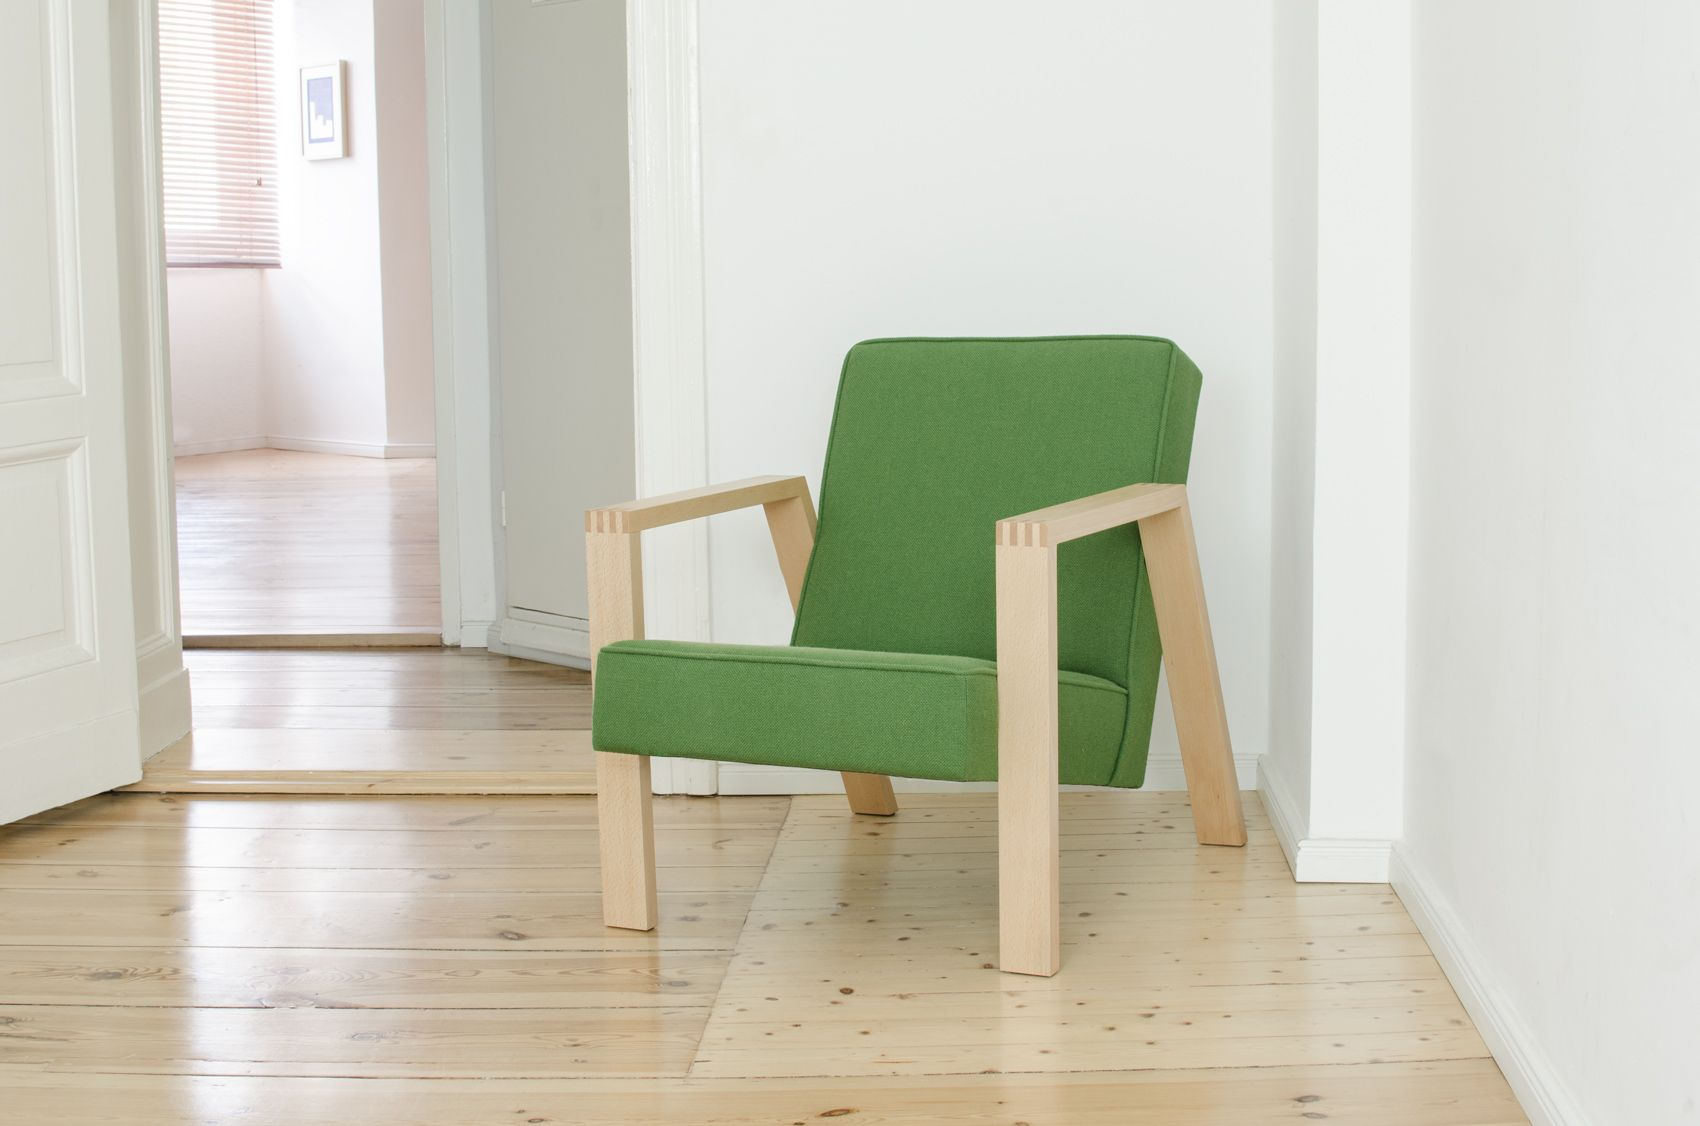 Pontier n armchair with kvadrat hallingdal upholstery